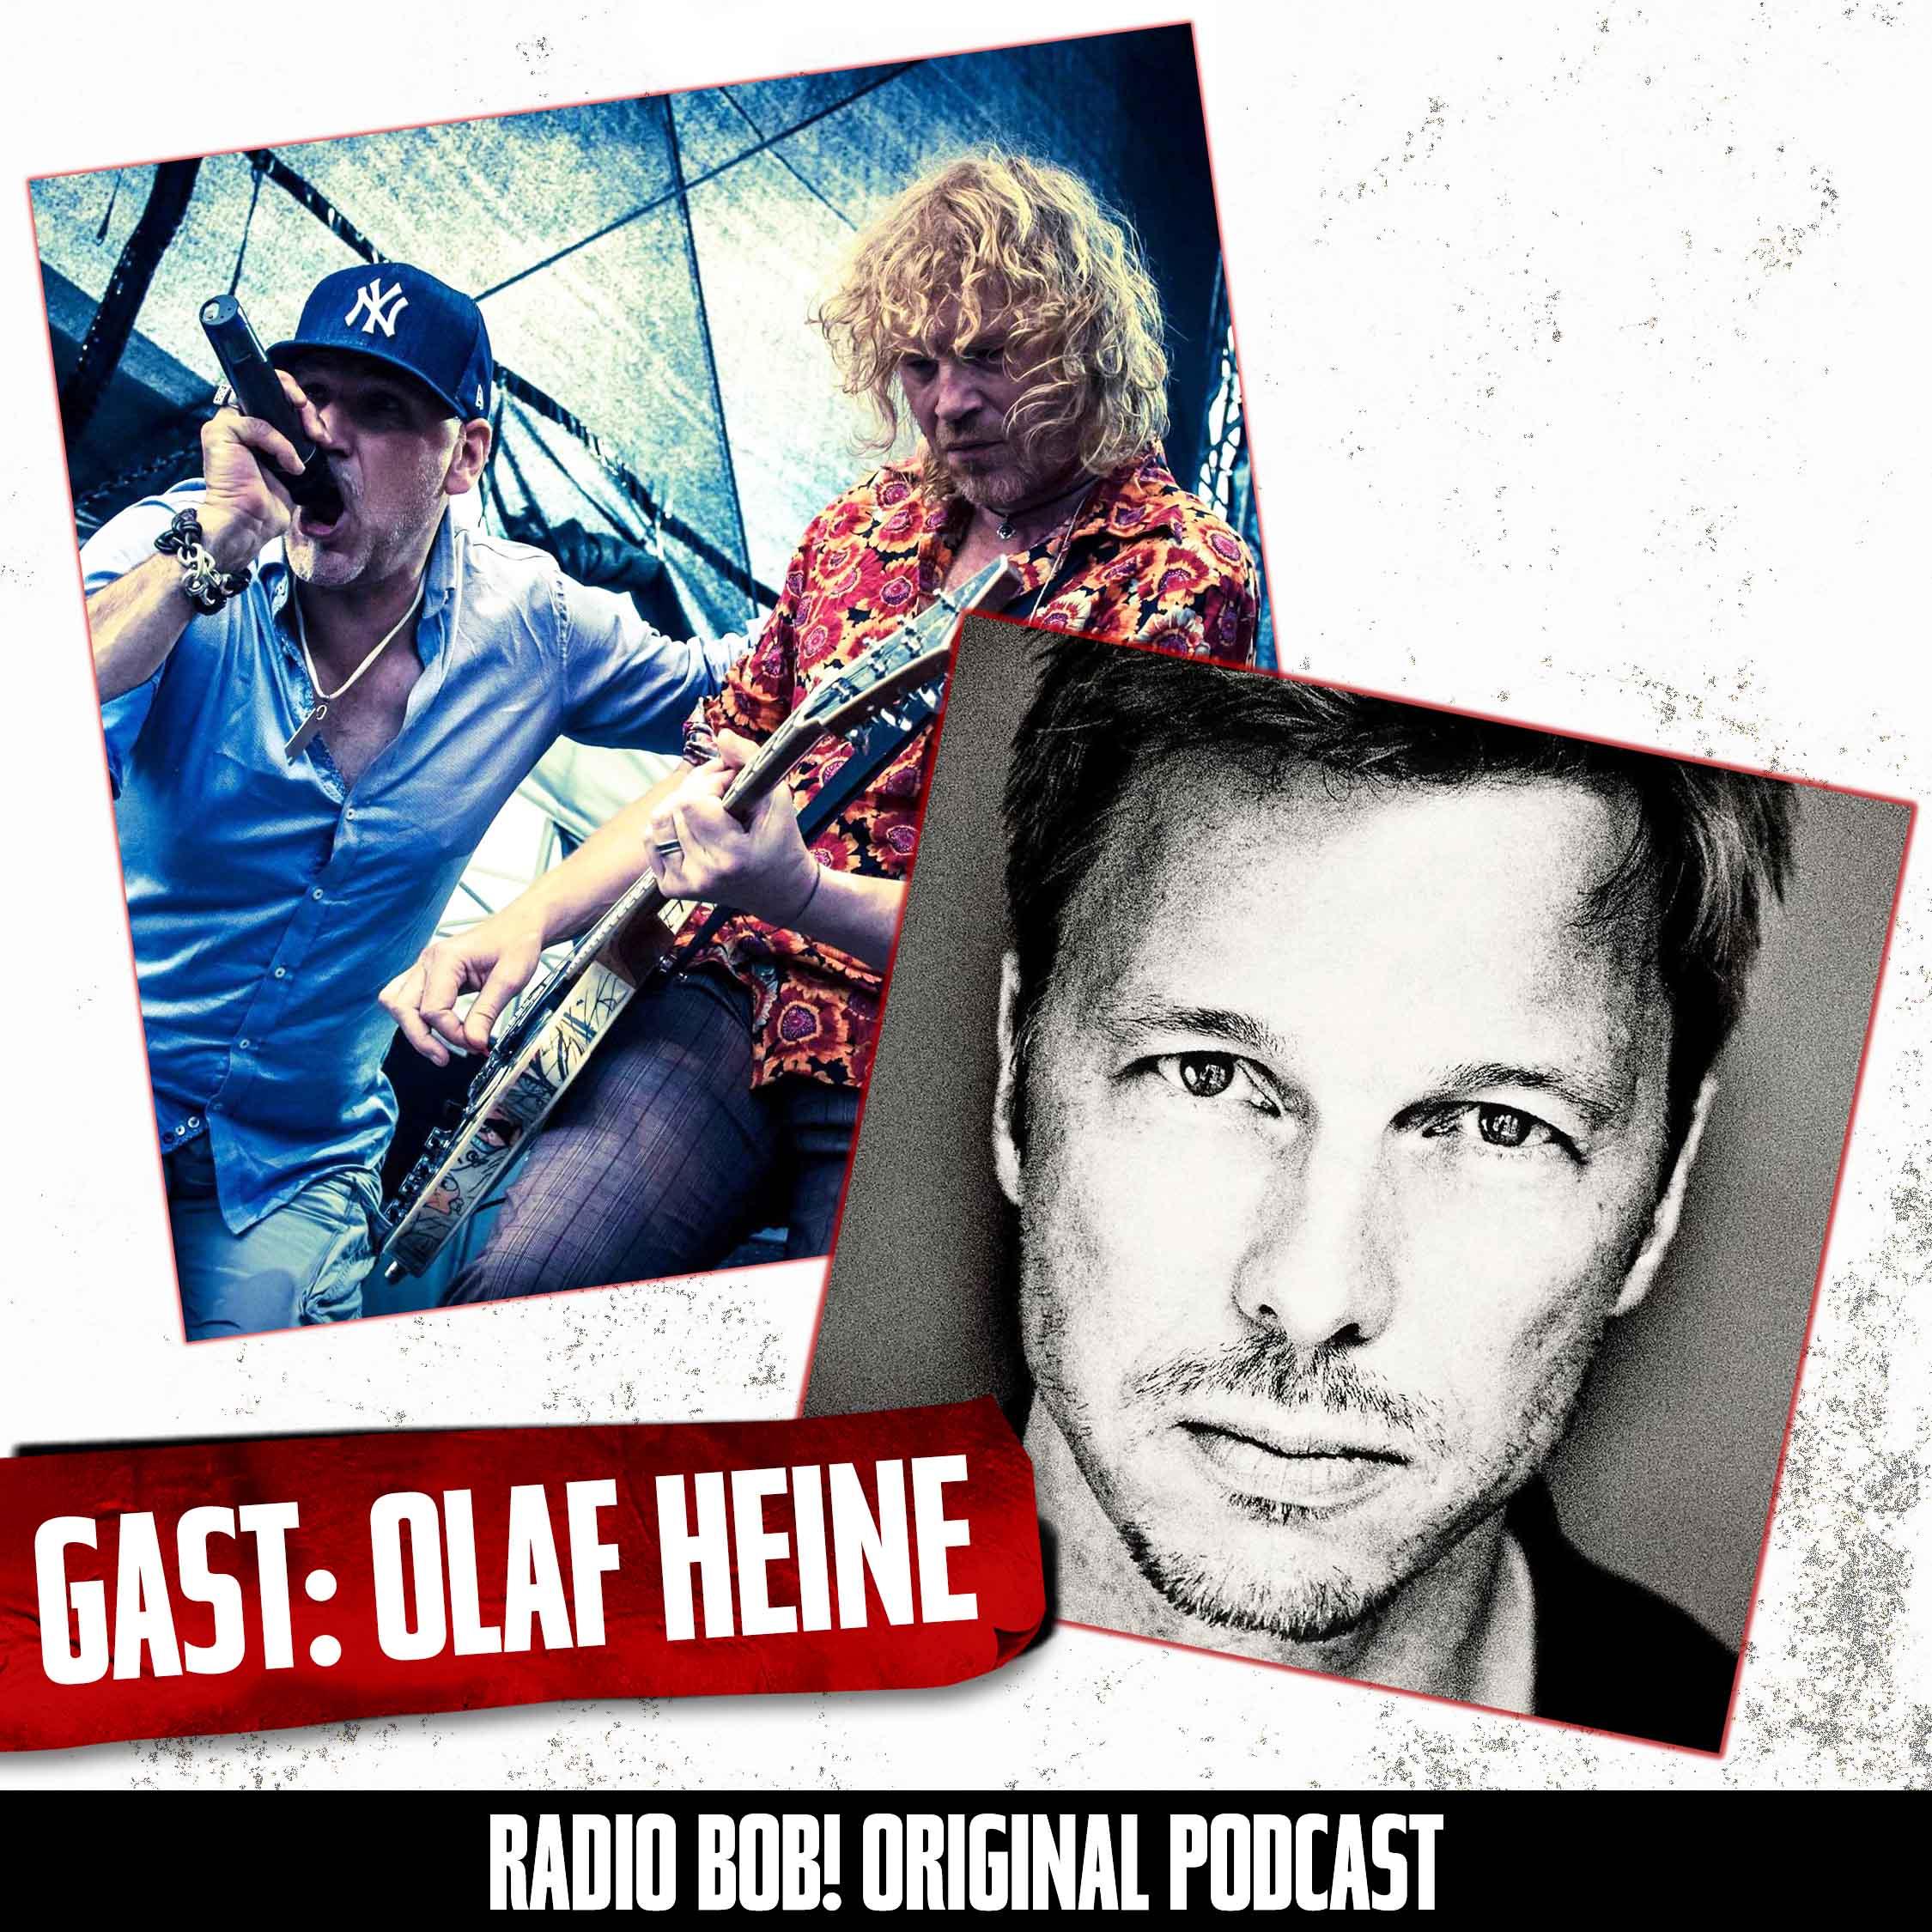 #20 - Musikfotograf Olaf Heine